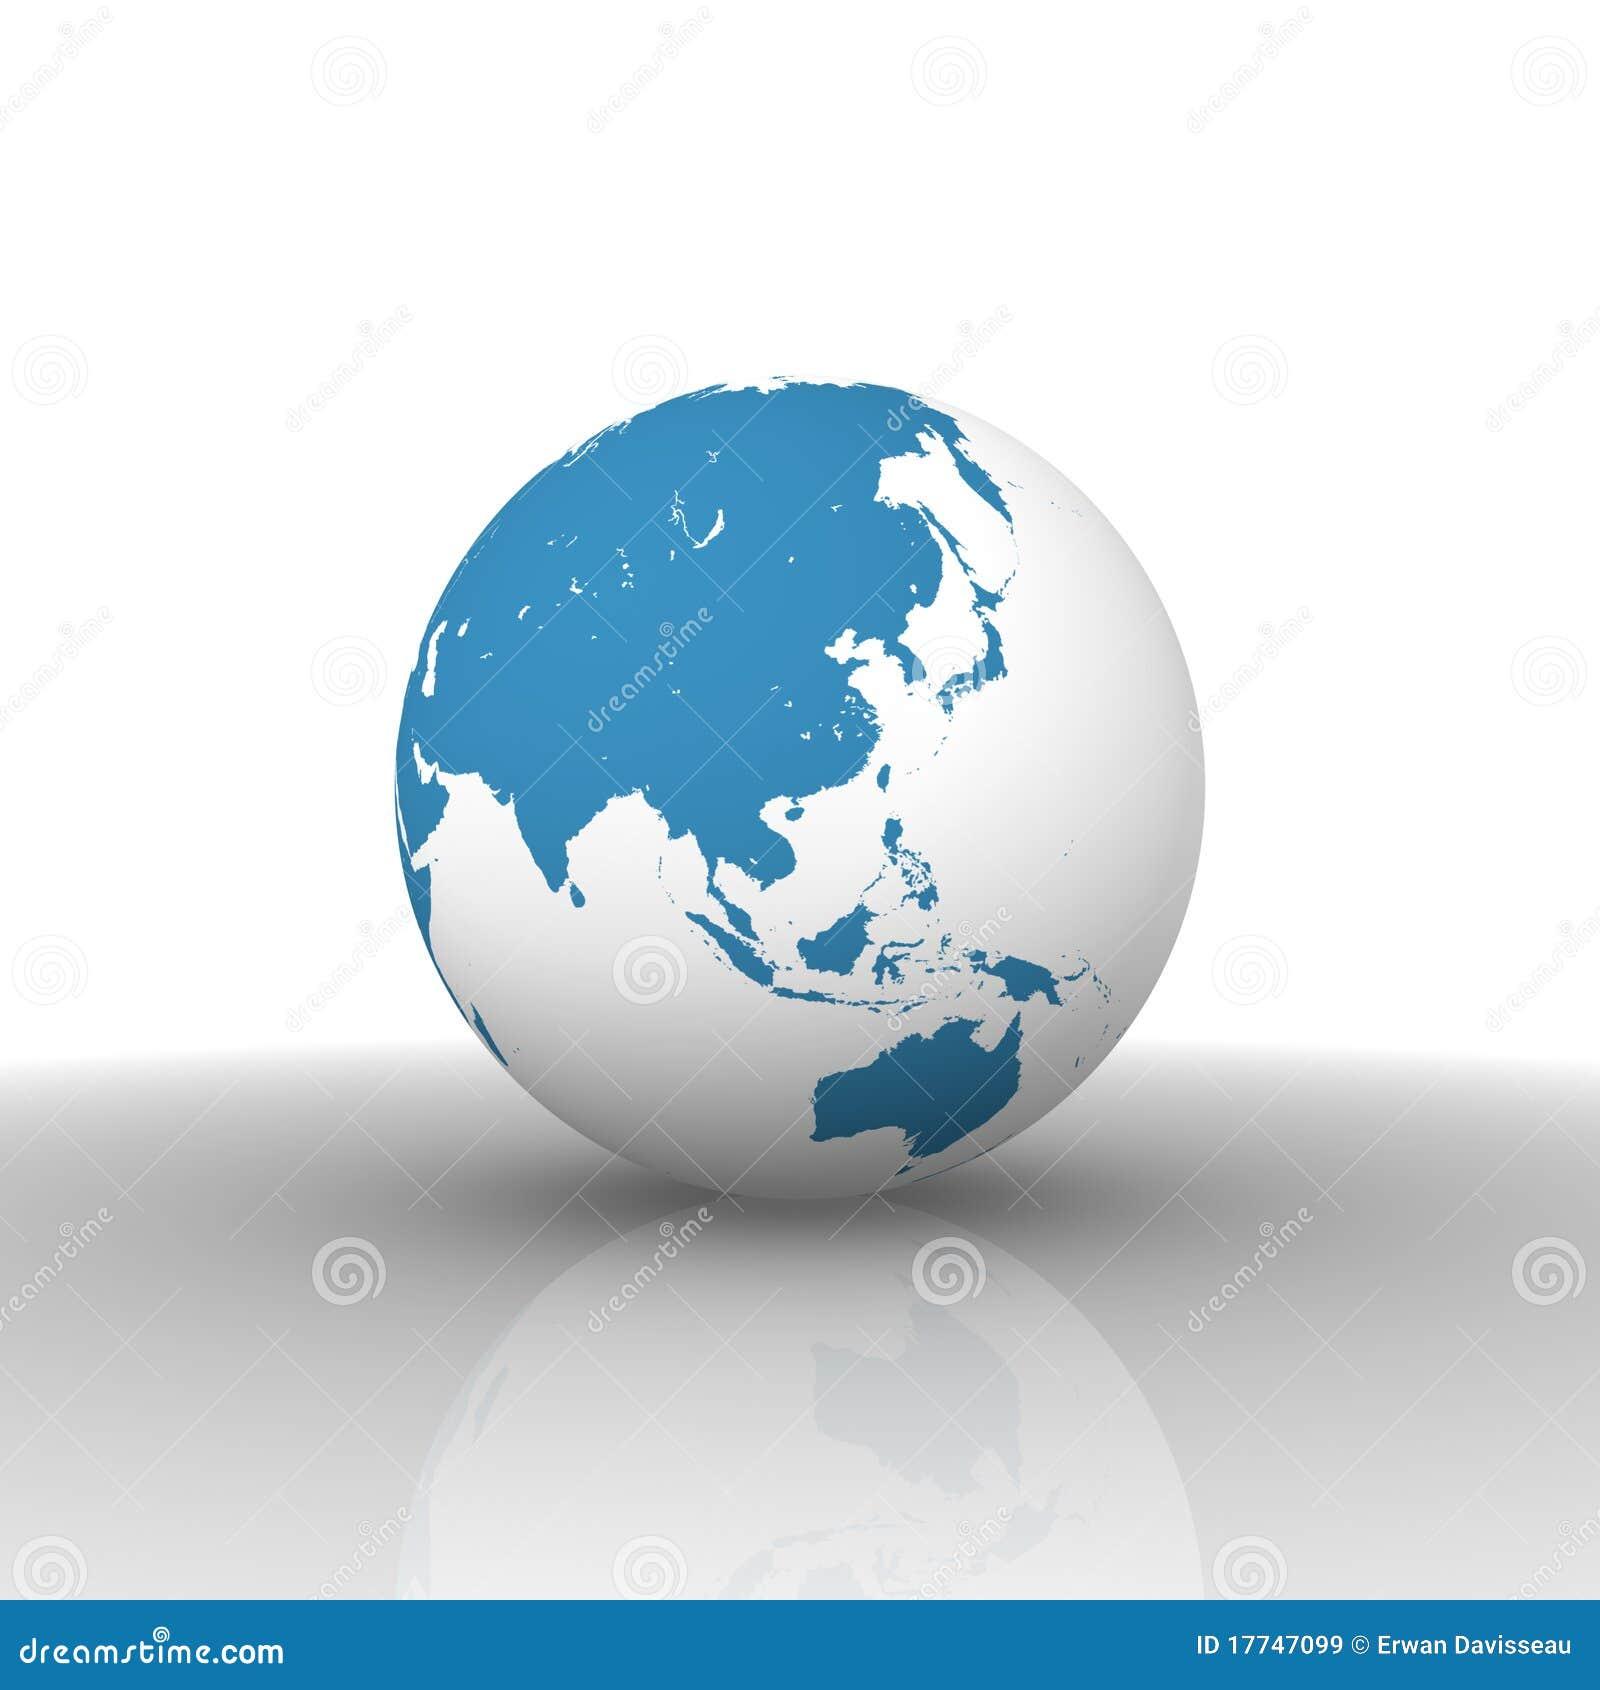 World map asia stock illustration illustration of blue 17747099 world map asia gumiabroncs Gallery